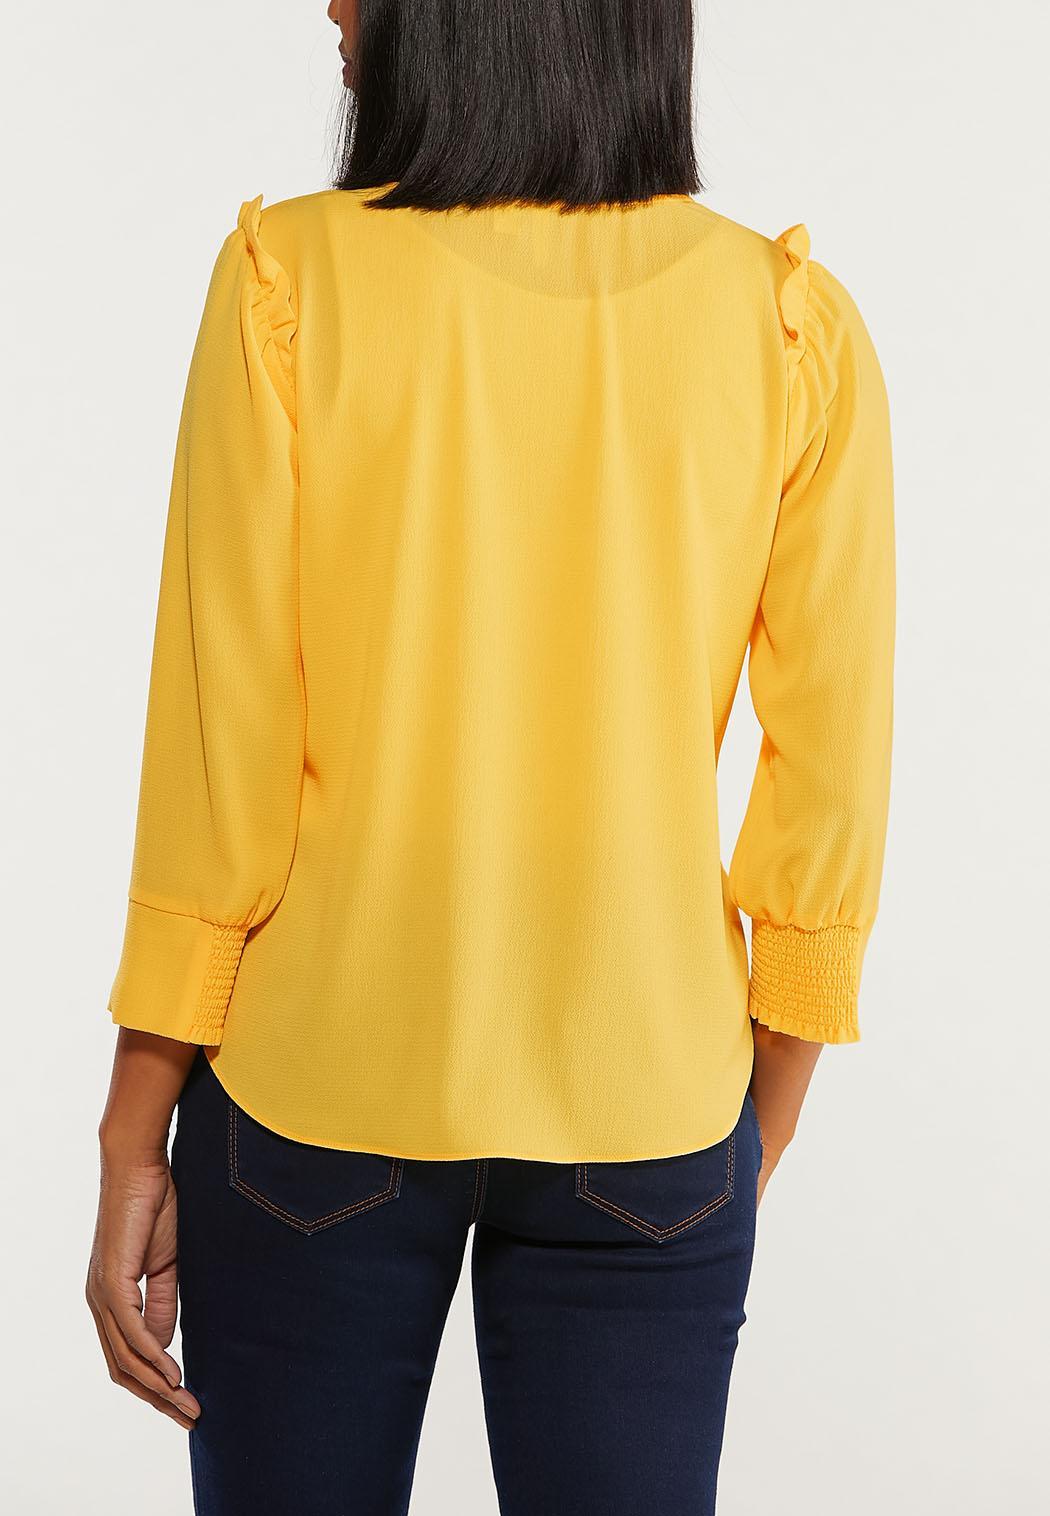 Gold Ruffled Shoulder Top (Item #44515664)